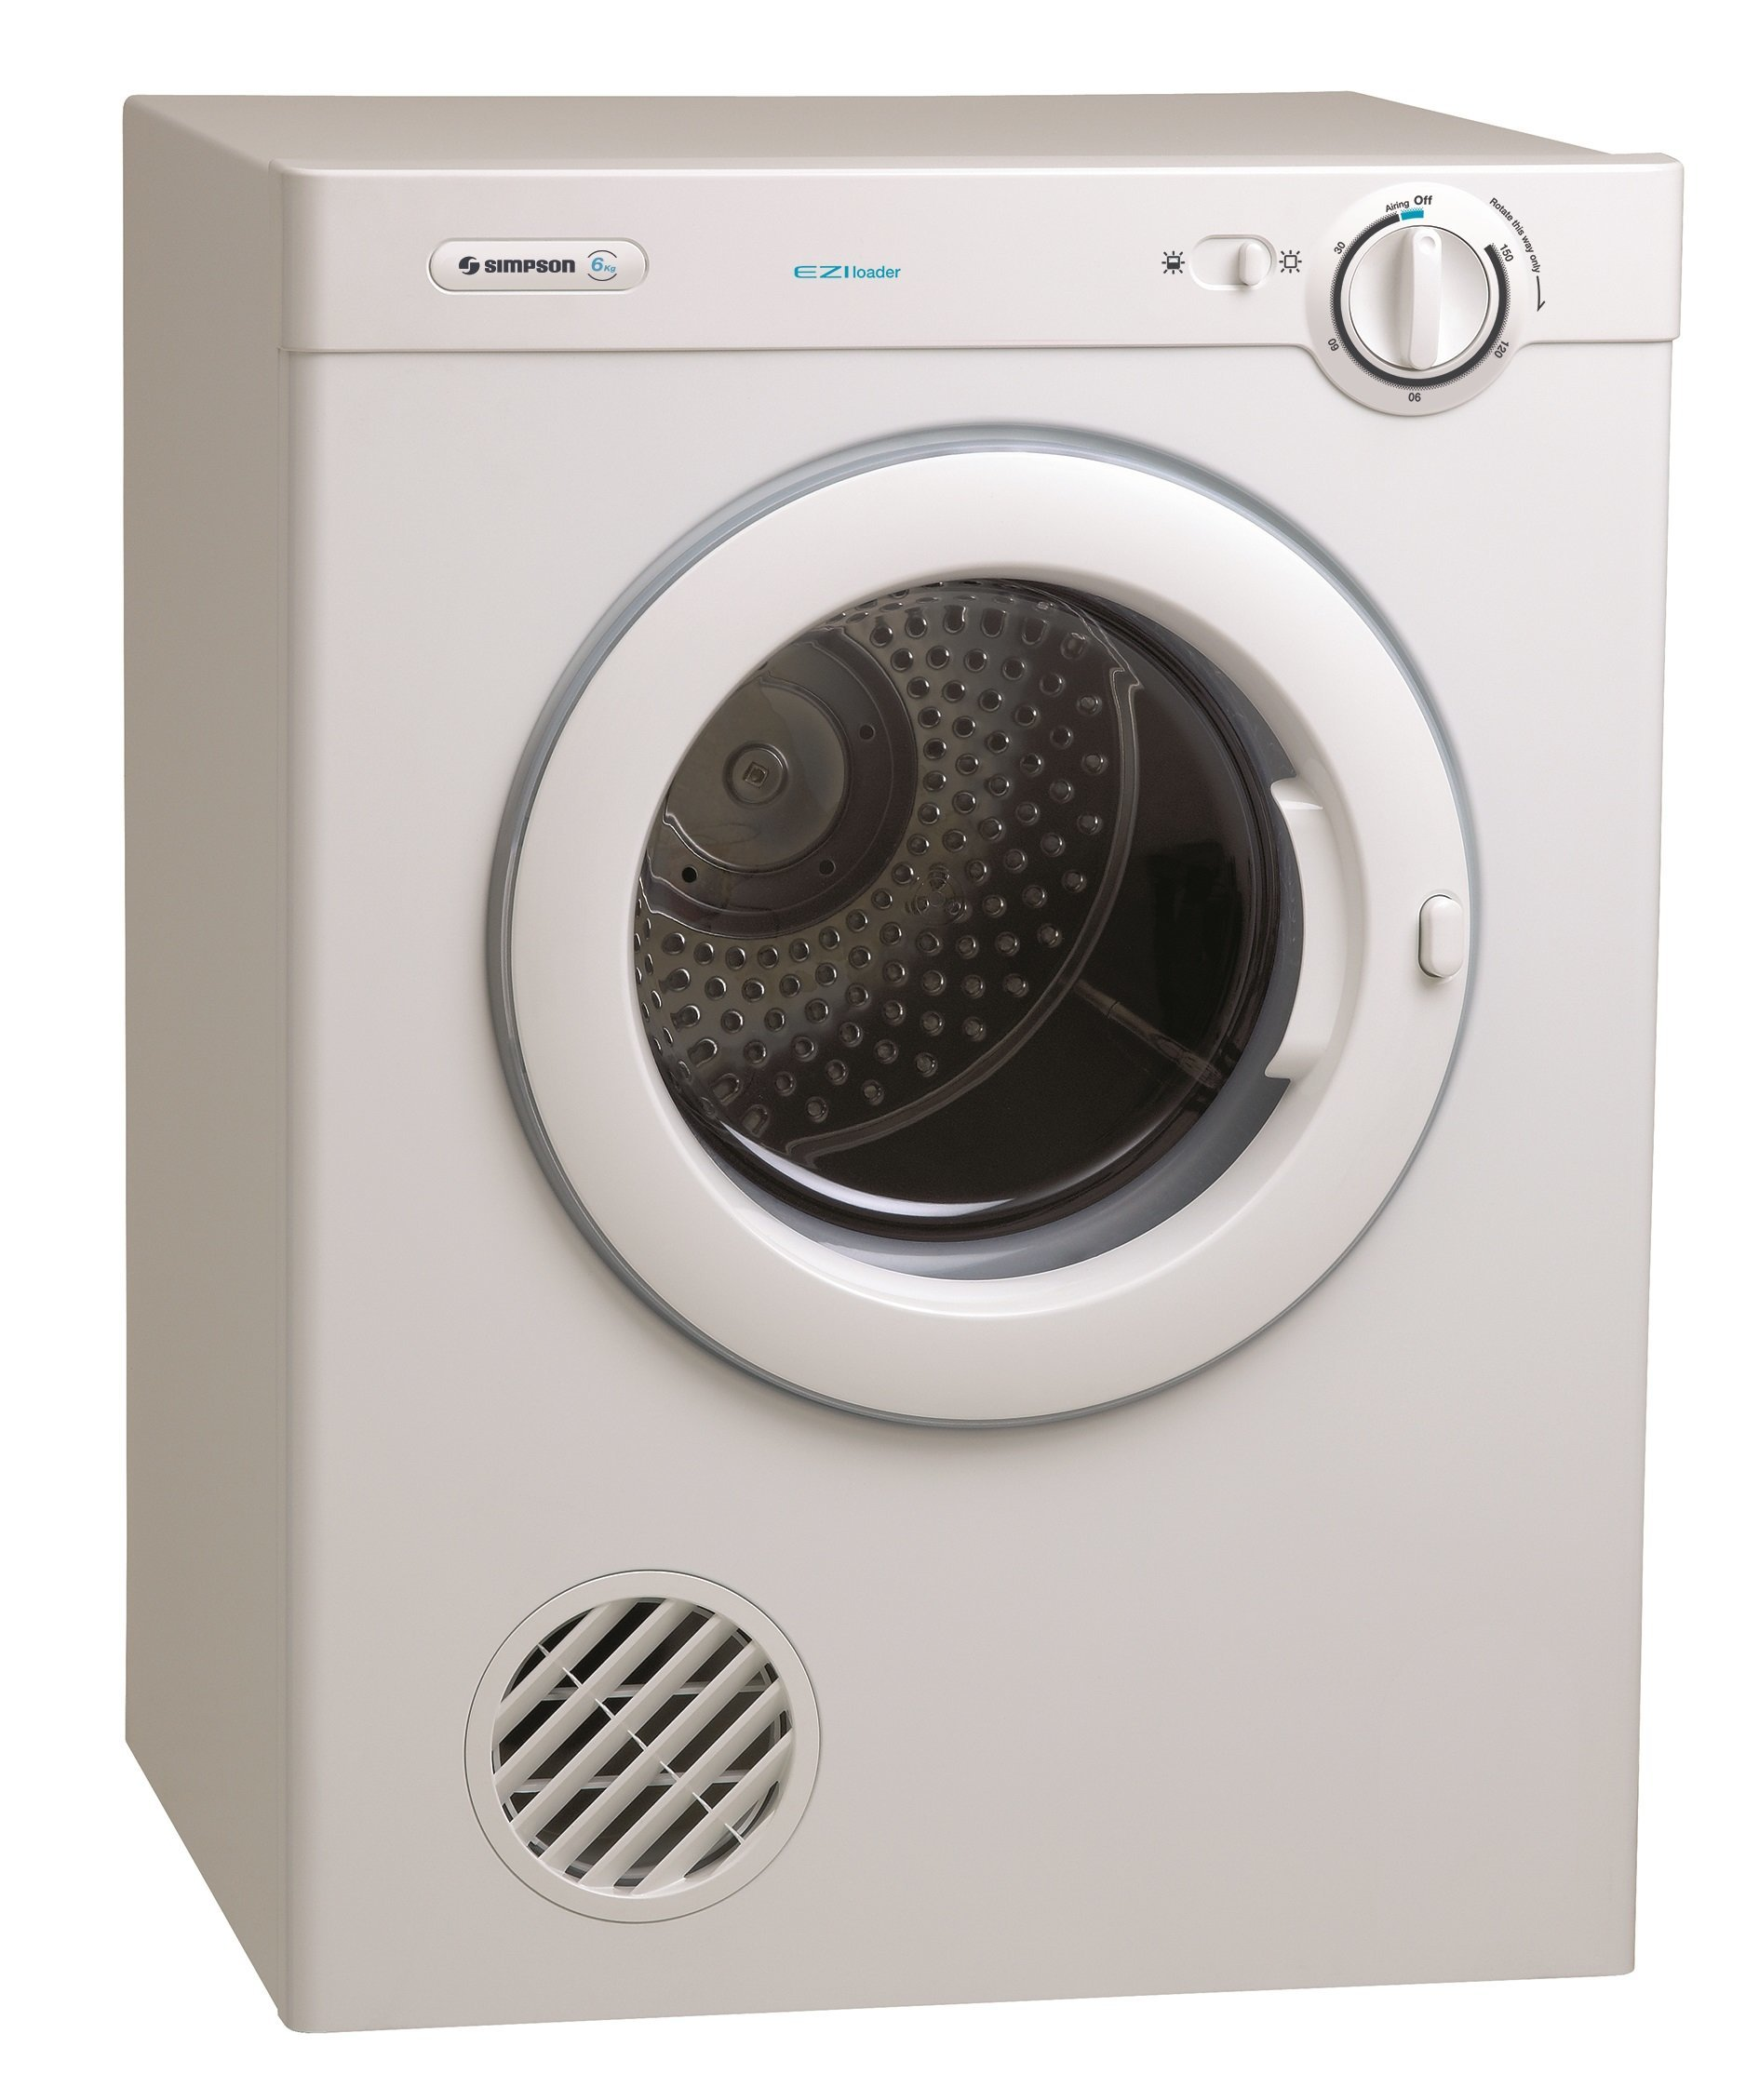 Simpson washing machine wiring diagram library